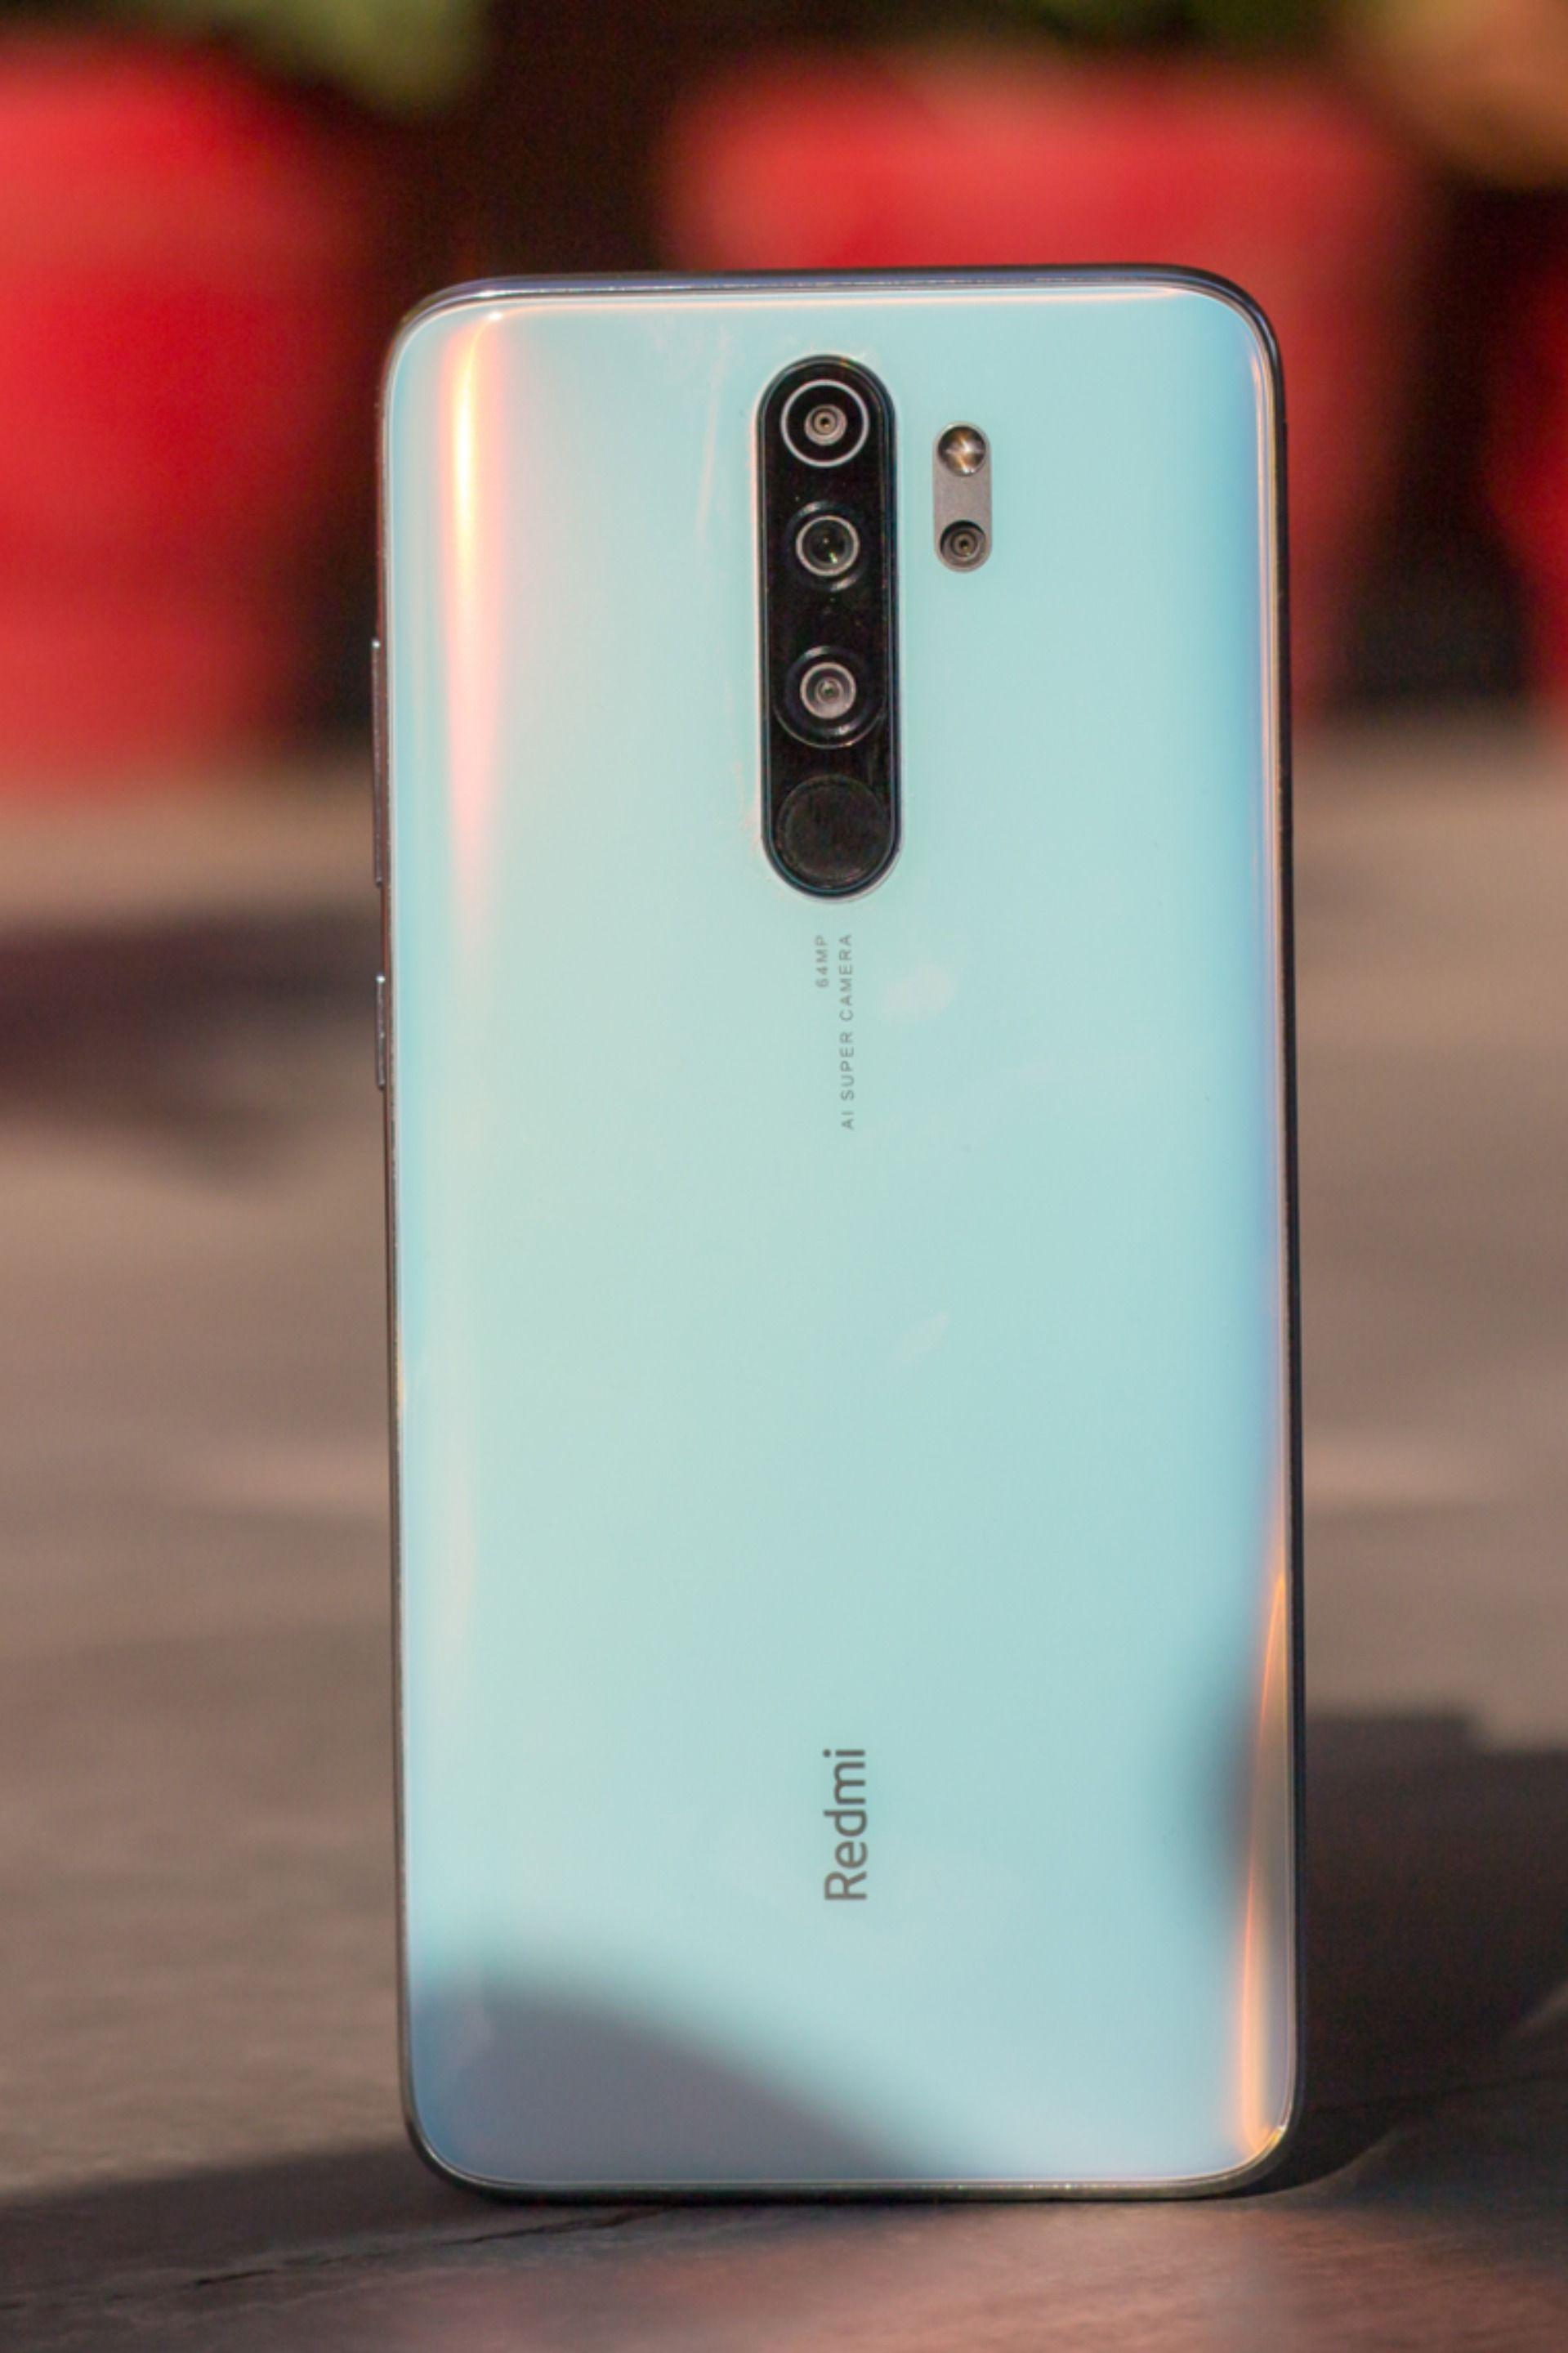 207 Coupon For Xiaomi Redmi Note 8 Pro 128gb In 2020 Xiaomi Phone Smartphone Deals